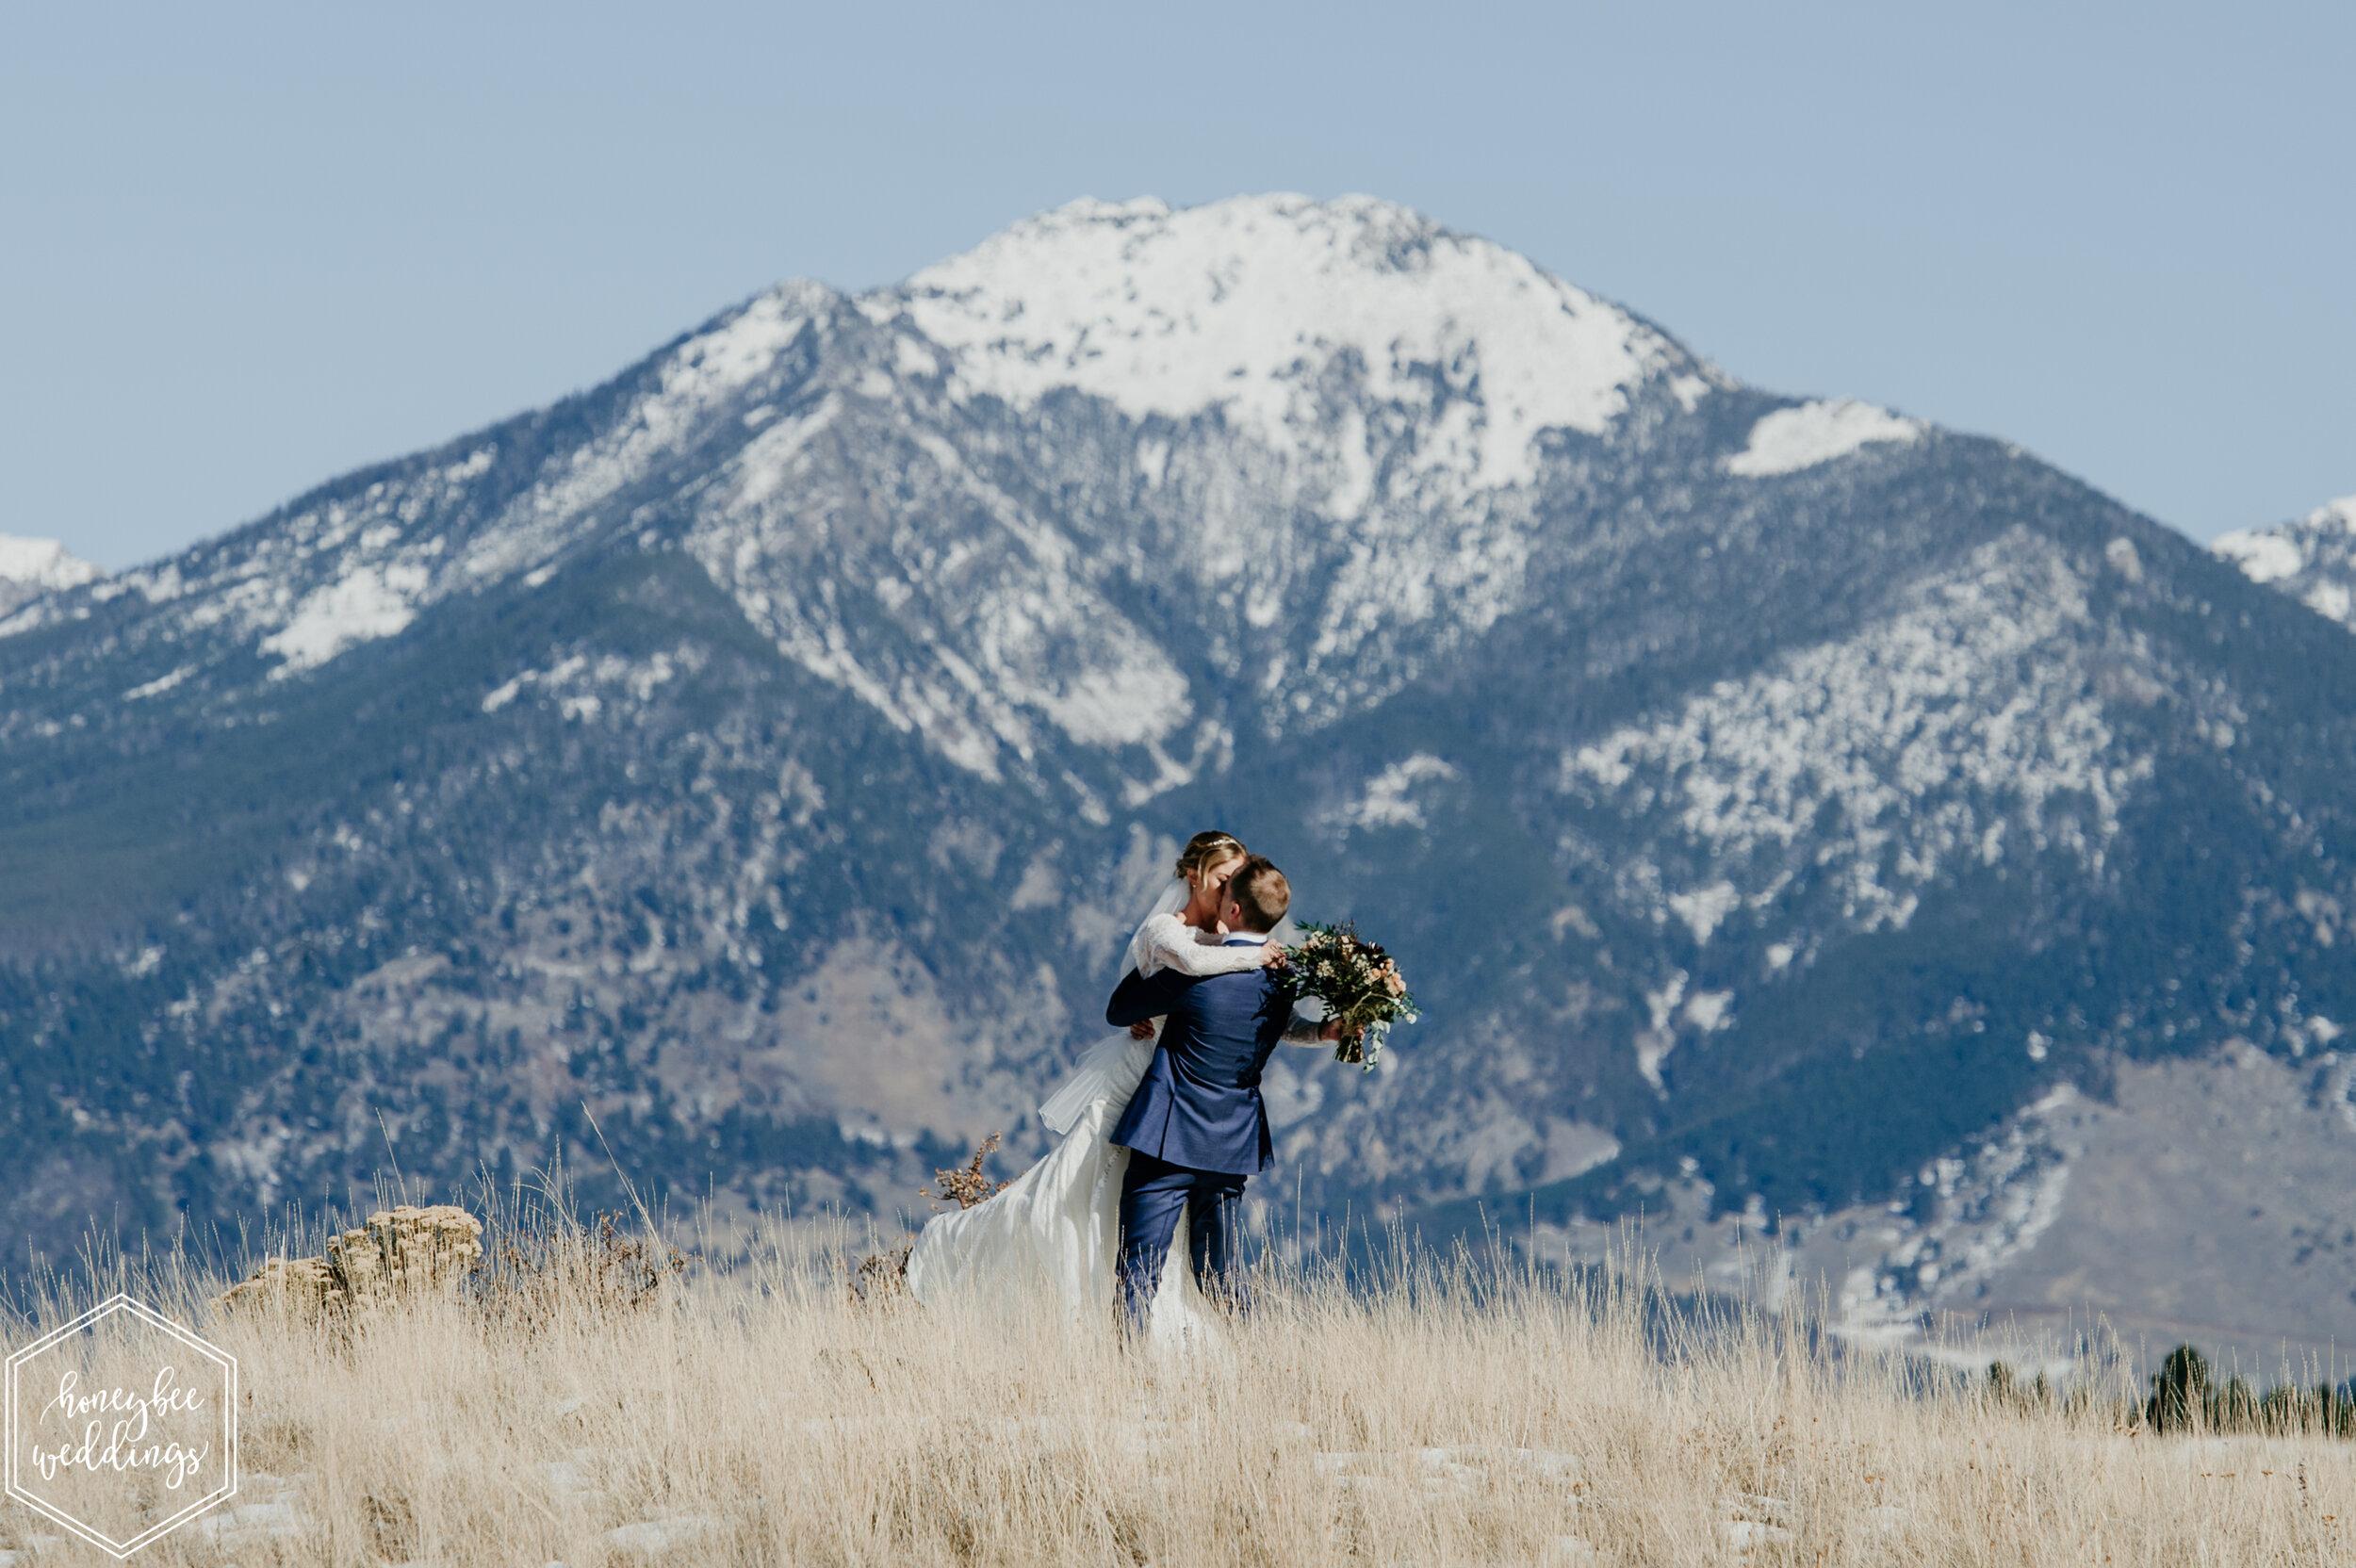 074Chico Hot Springs Wedding_Montana Wedding Photographer_Winter Wedding_Ariel & Richard_October 12, 2019-2104.jpg